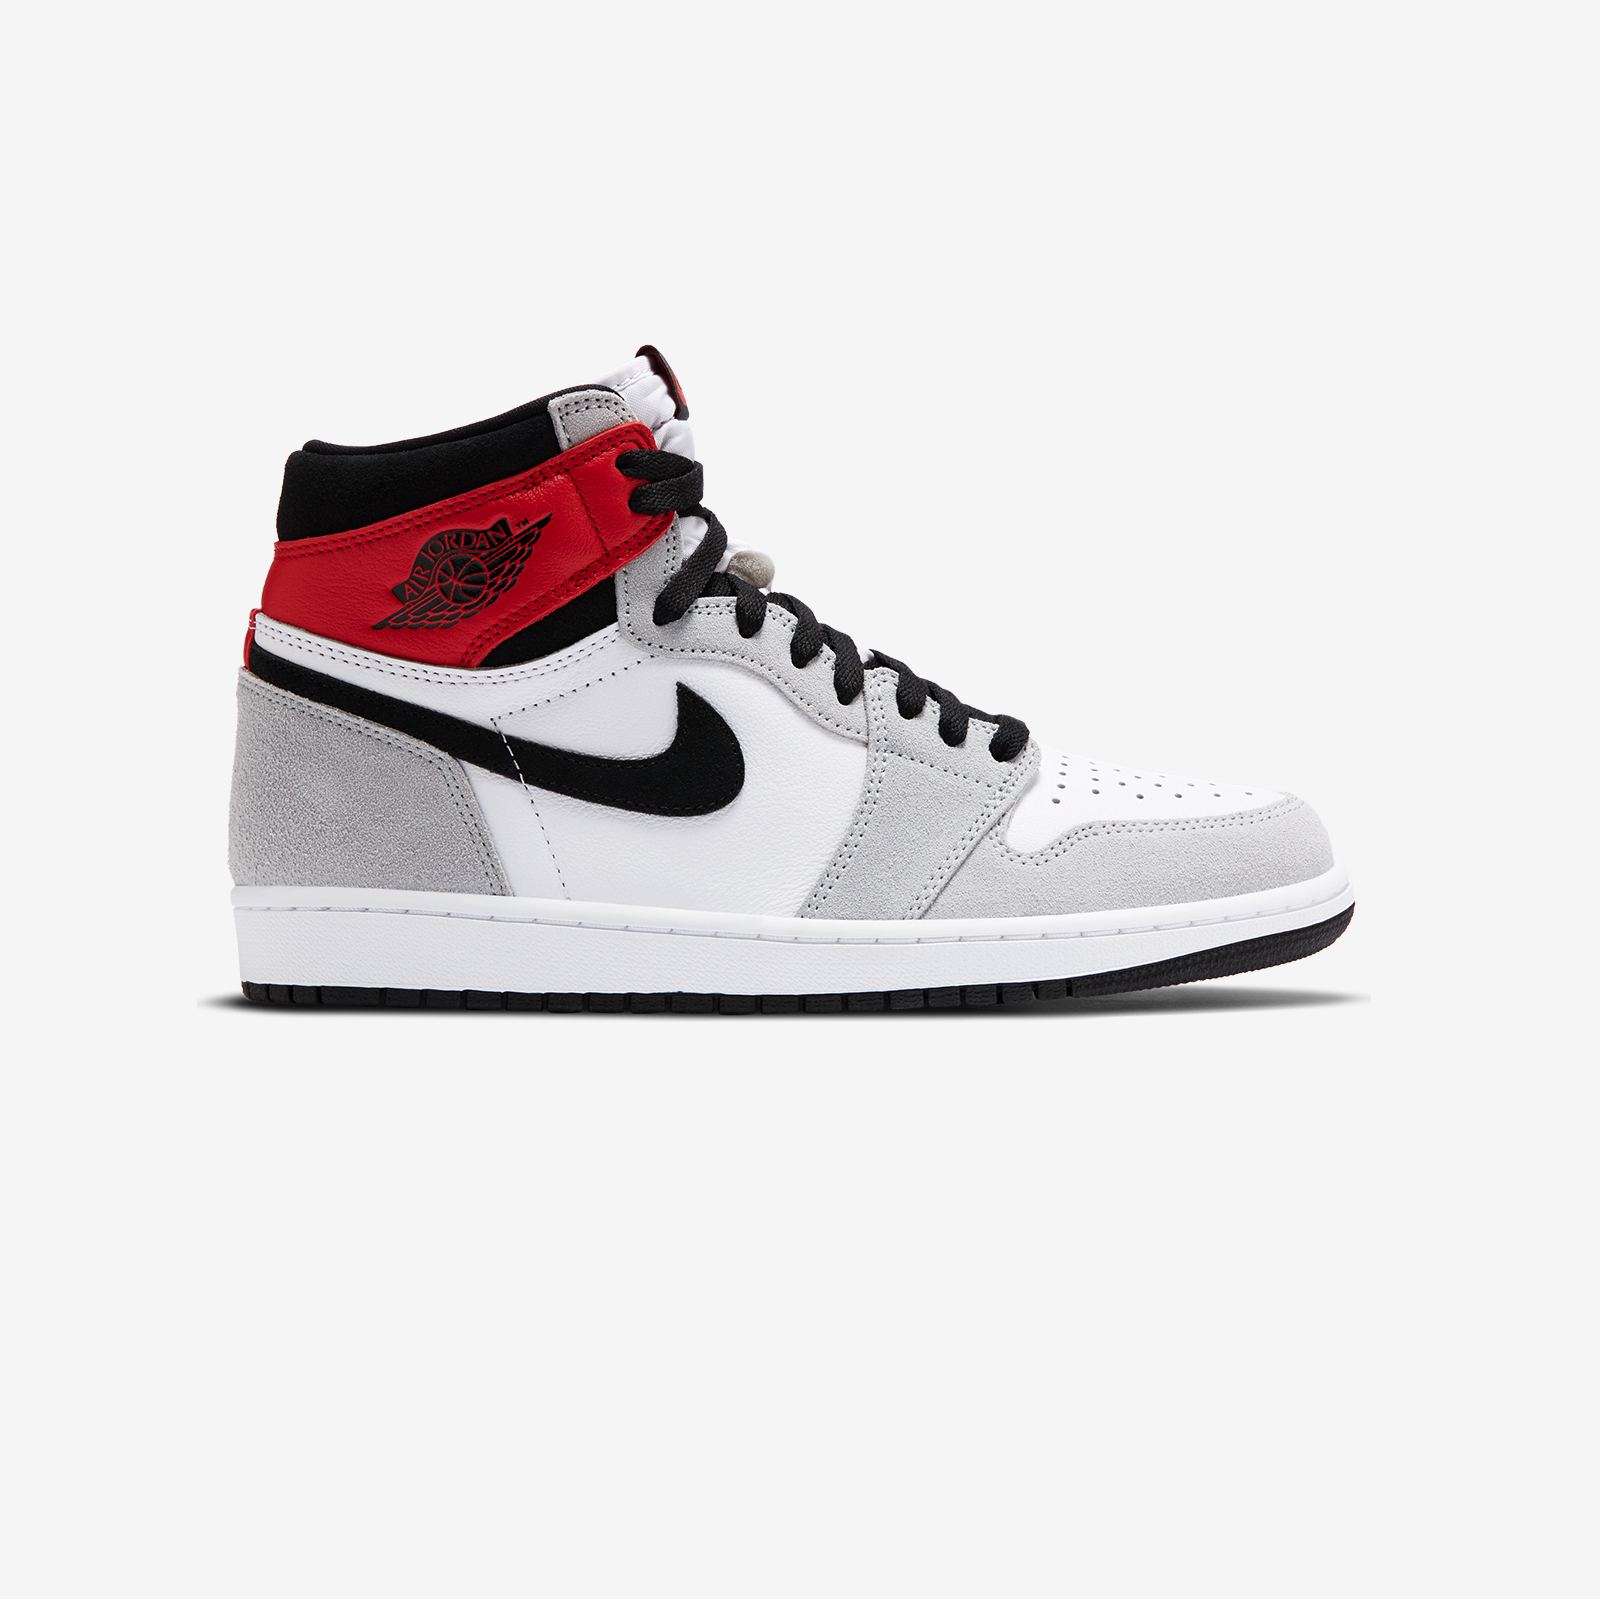 Jordan Brand Air Jordan 1 Retro High Og 555088 126